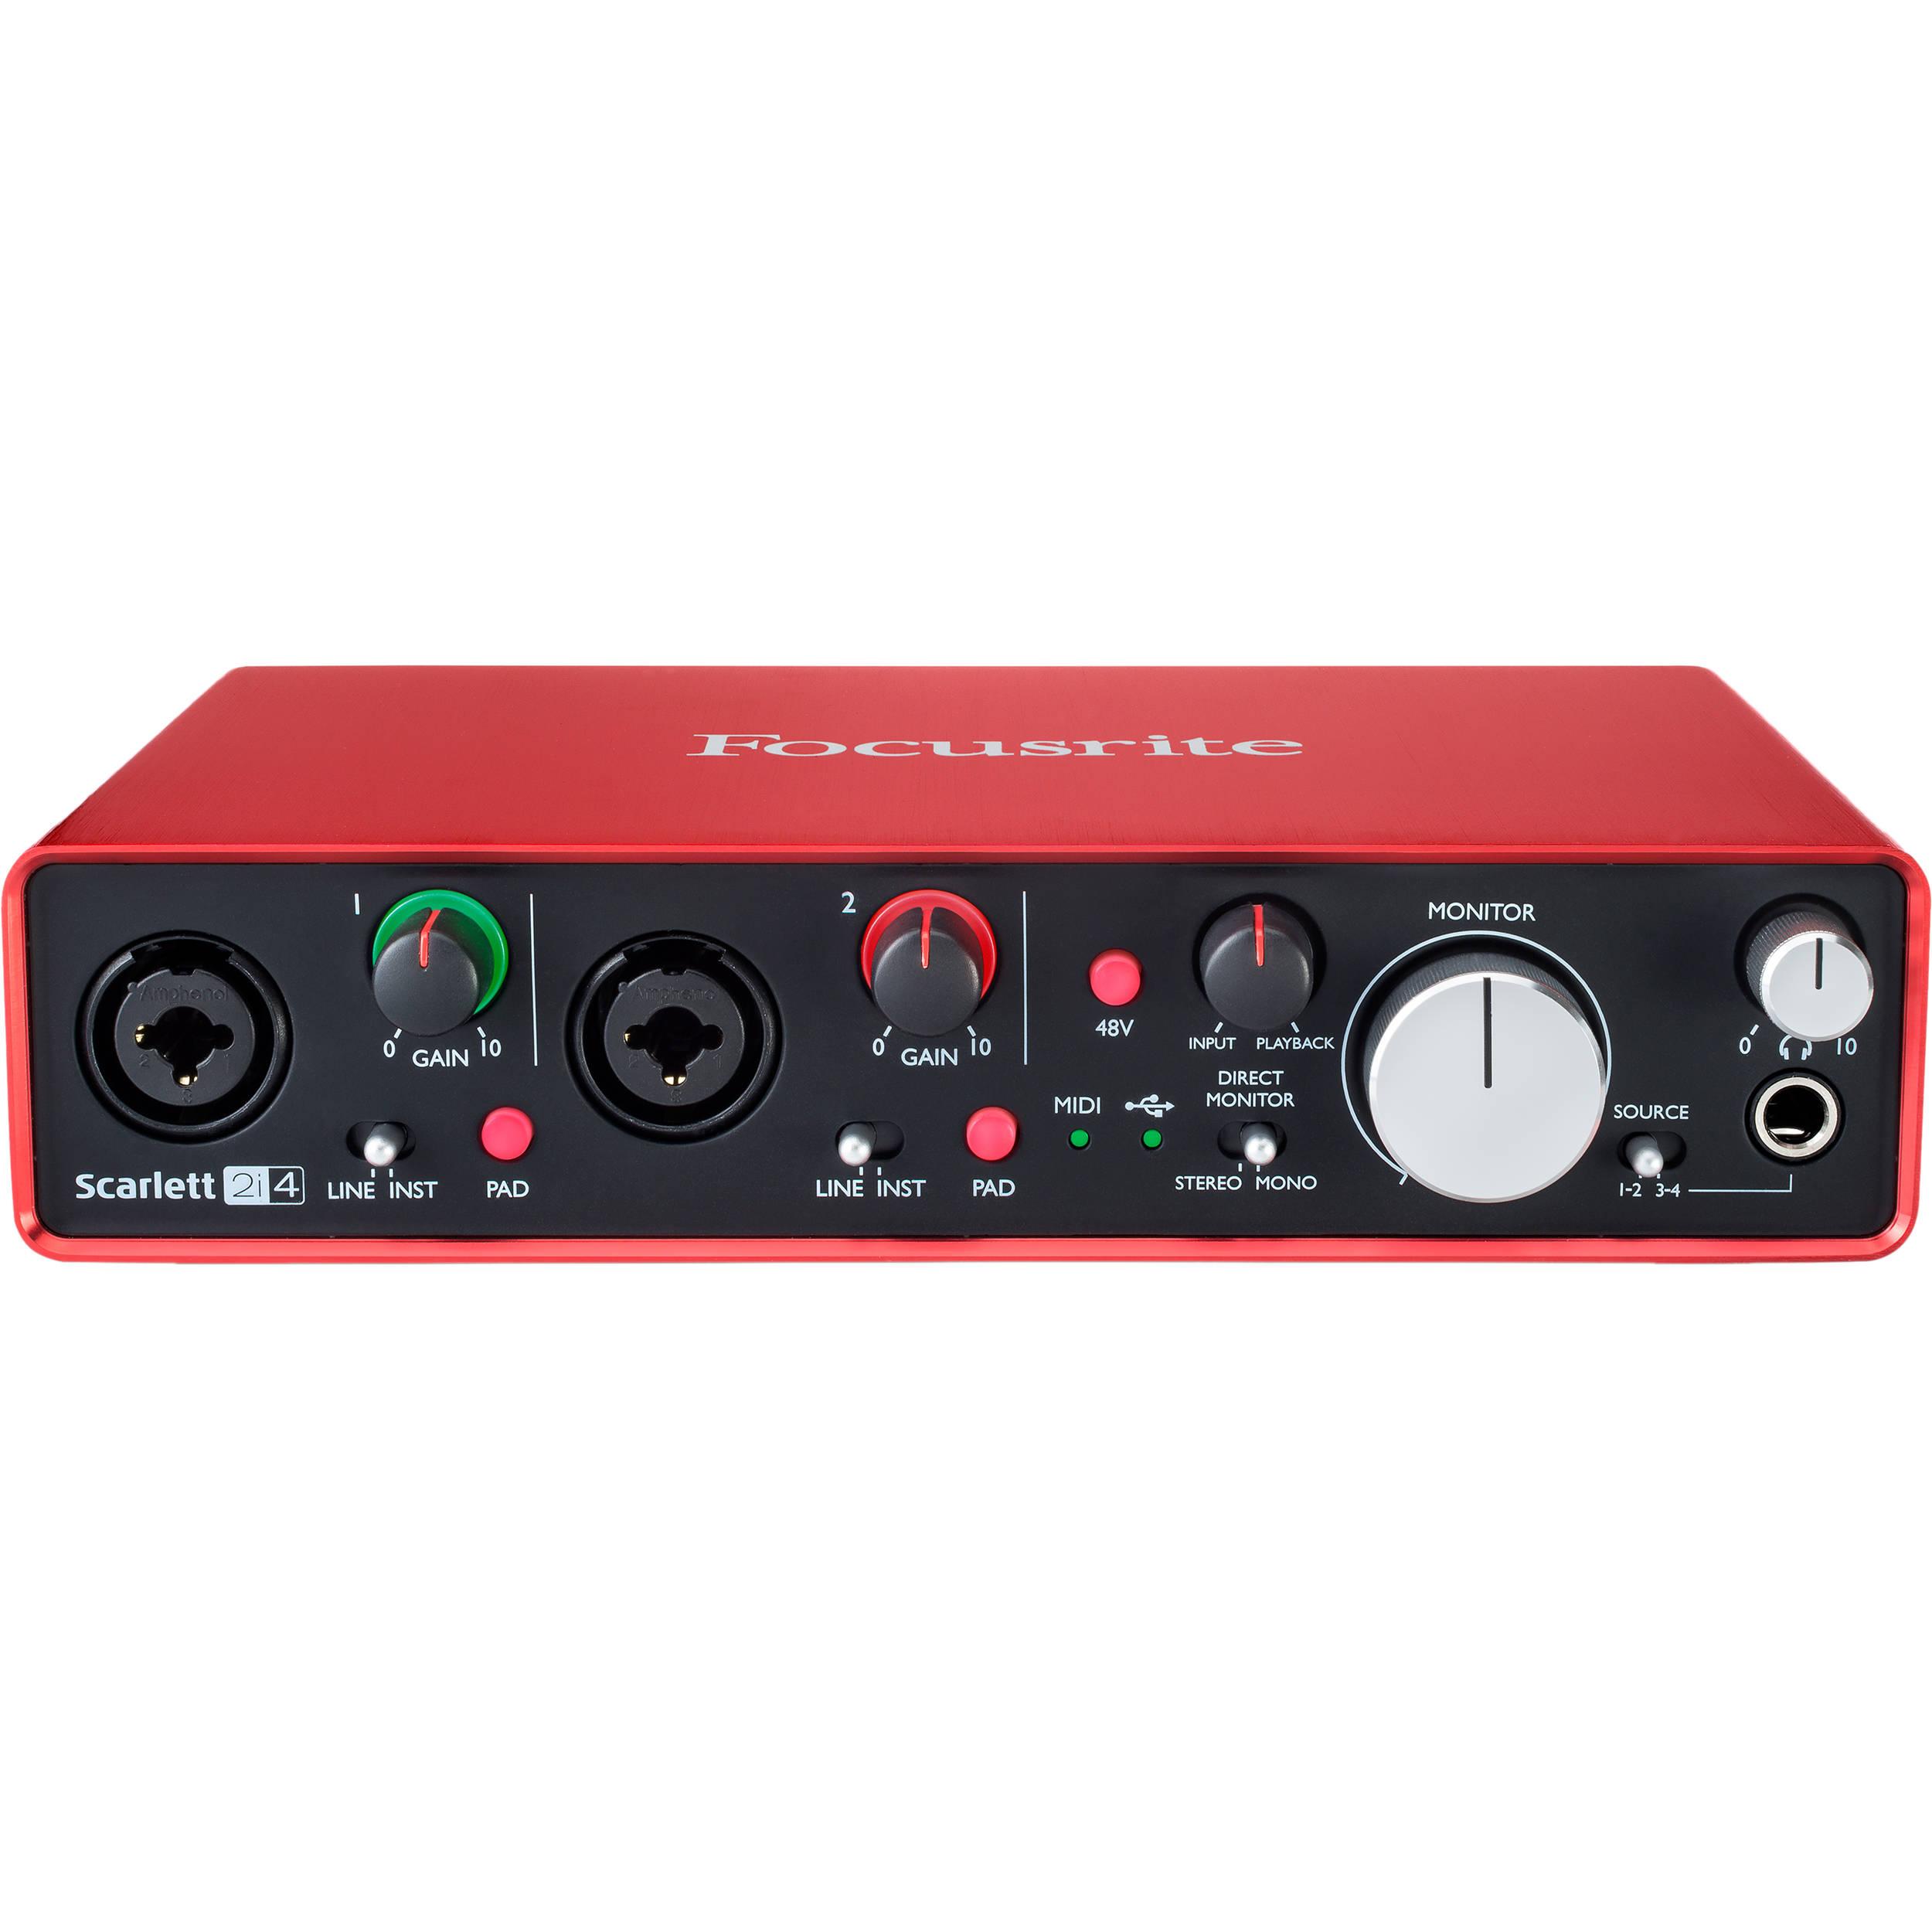 Focusrite Scarlett 2i4 USB Audio Interface (2nd Generation)